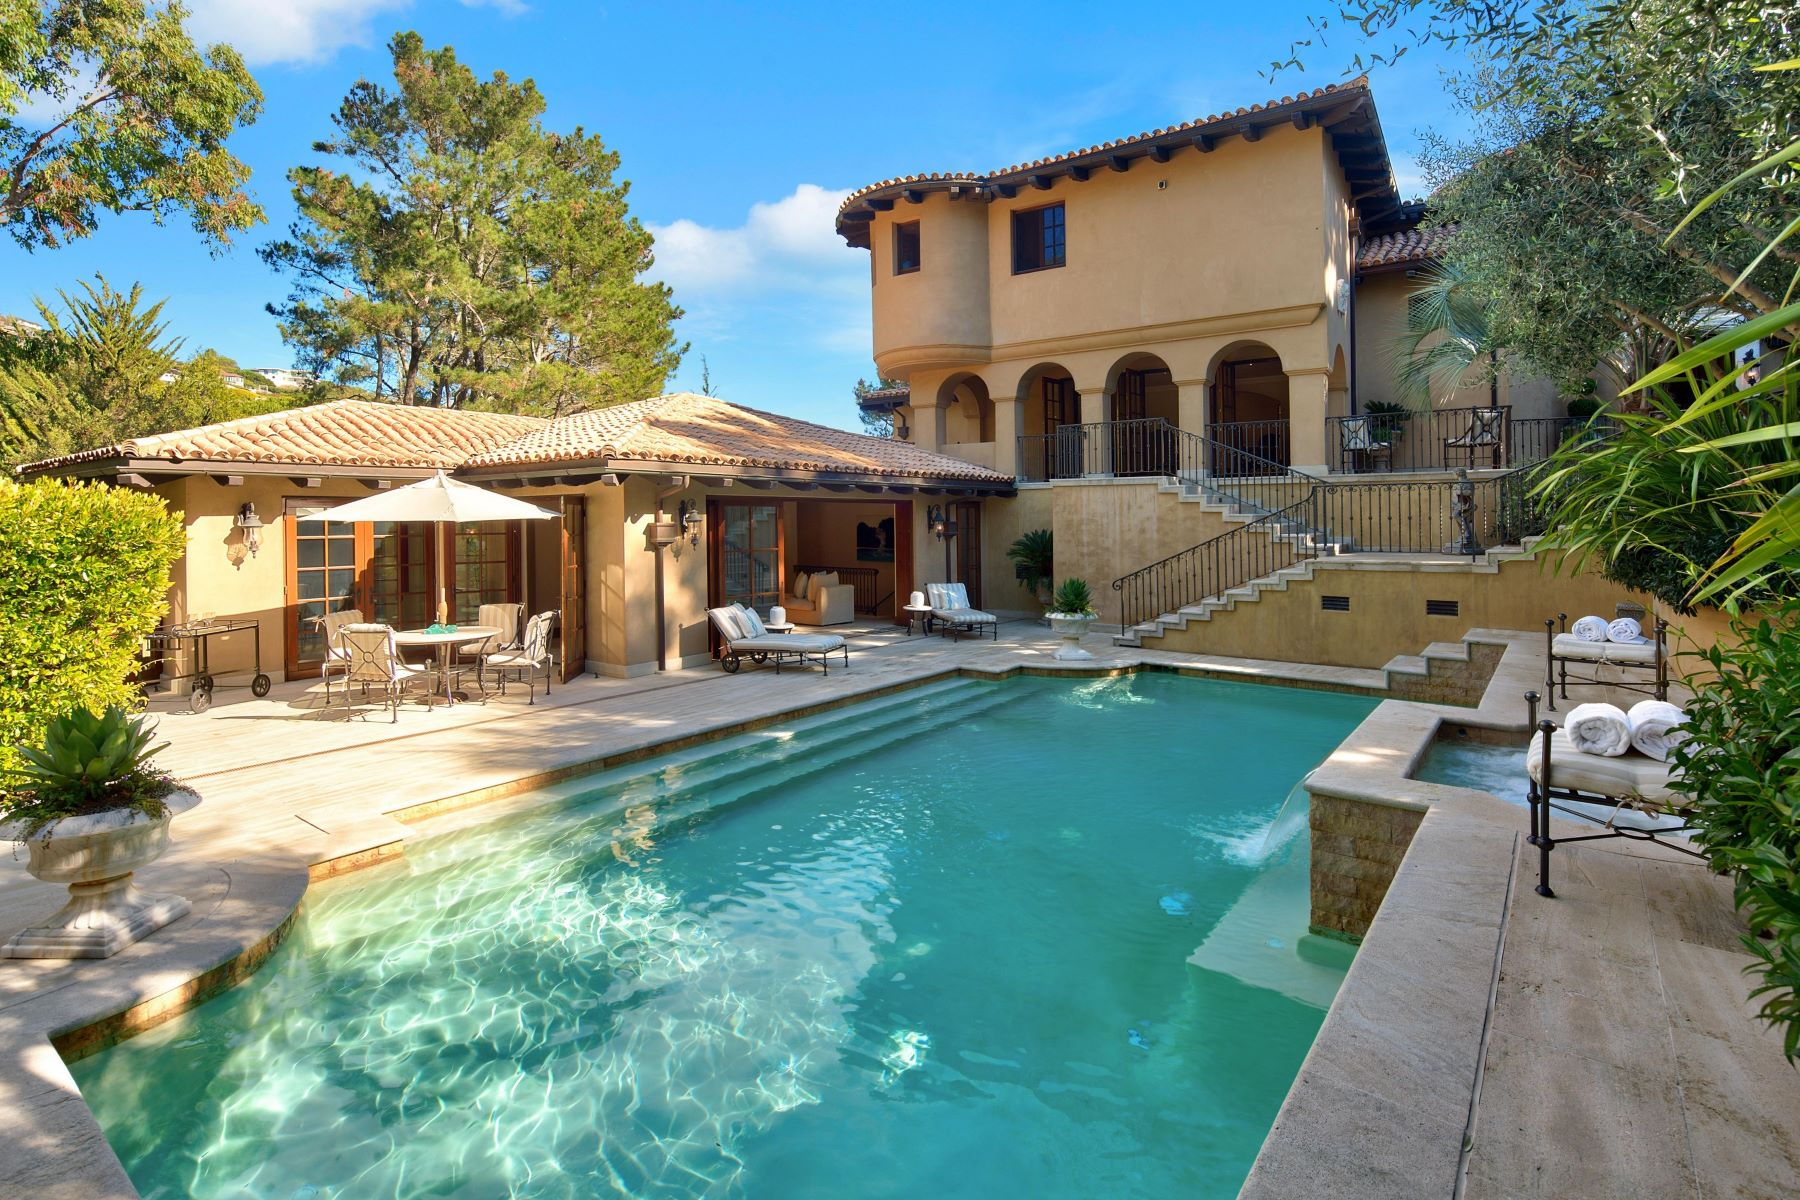 Single Family Home for Sale at Tiburon's Magnificent Mediterranean 12 Tara Hill Rd Tiburon, California 94920 United States